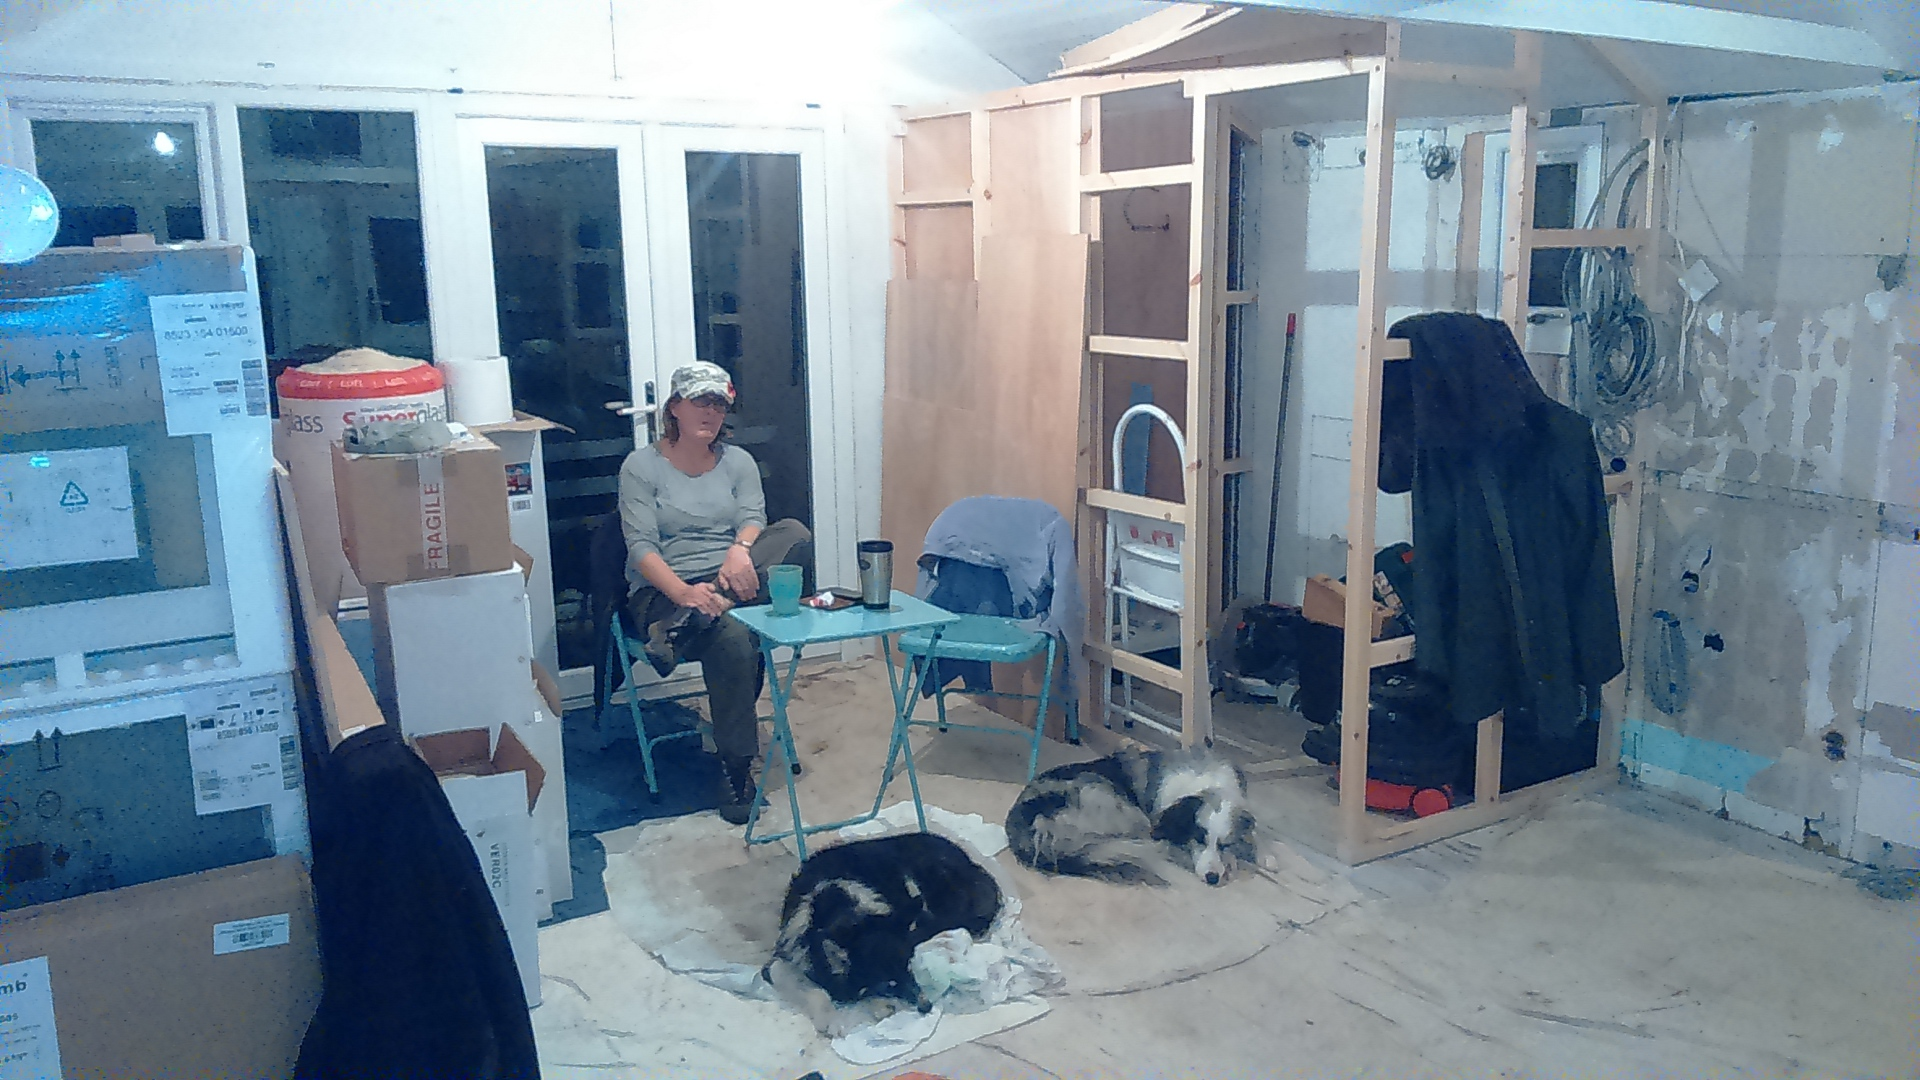 Dunster, luxury, Beach, hut, Salad, Days, restoration, refurbished, refurbishment